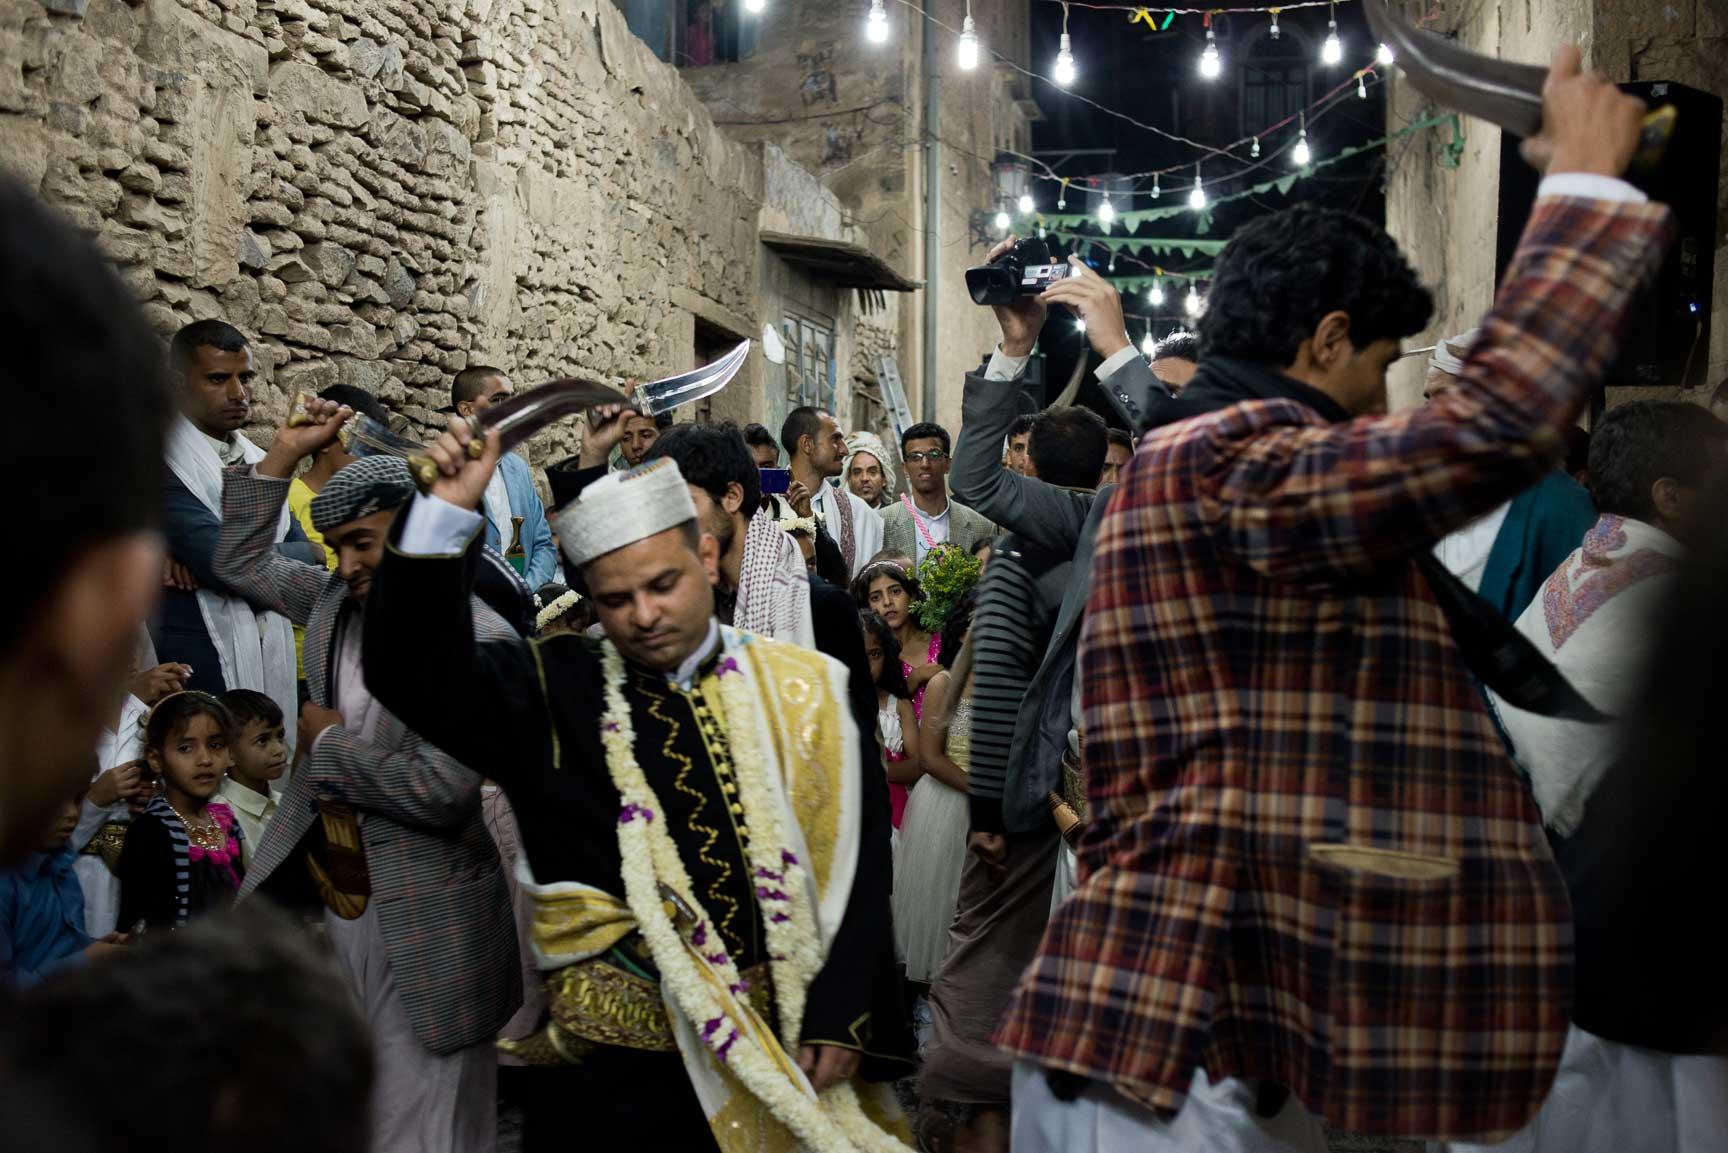 Yemeni men dance the bara'a, a traditional tribal dance of northern Yemen for a wedding celebration on June 4, 2015 in Sana'a, Yemen.